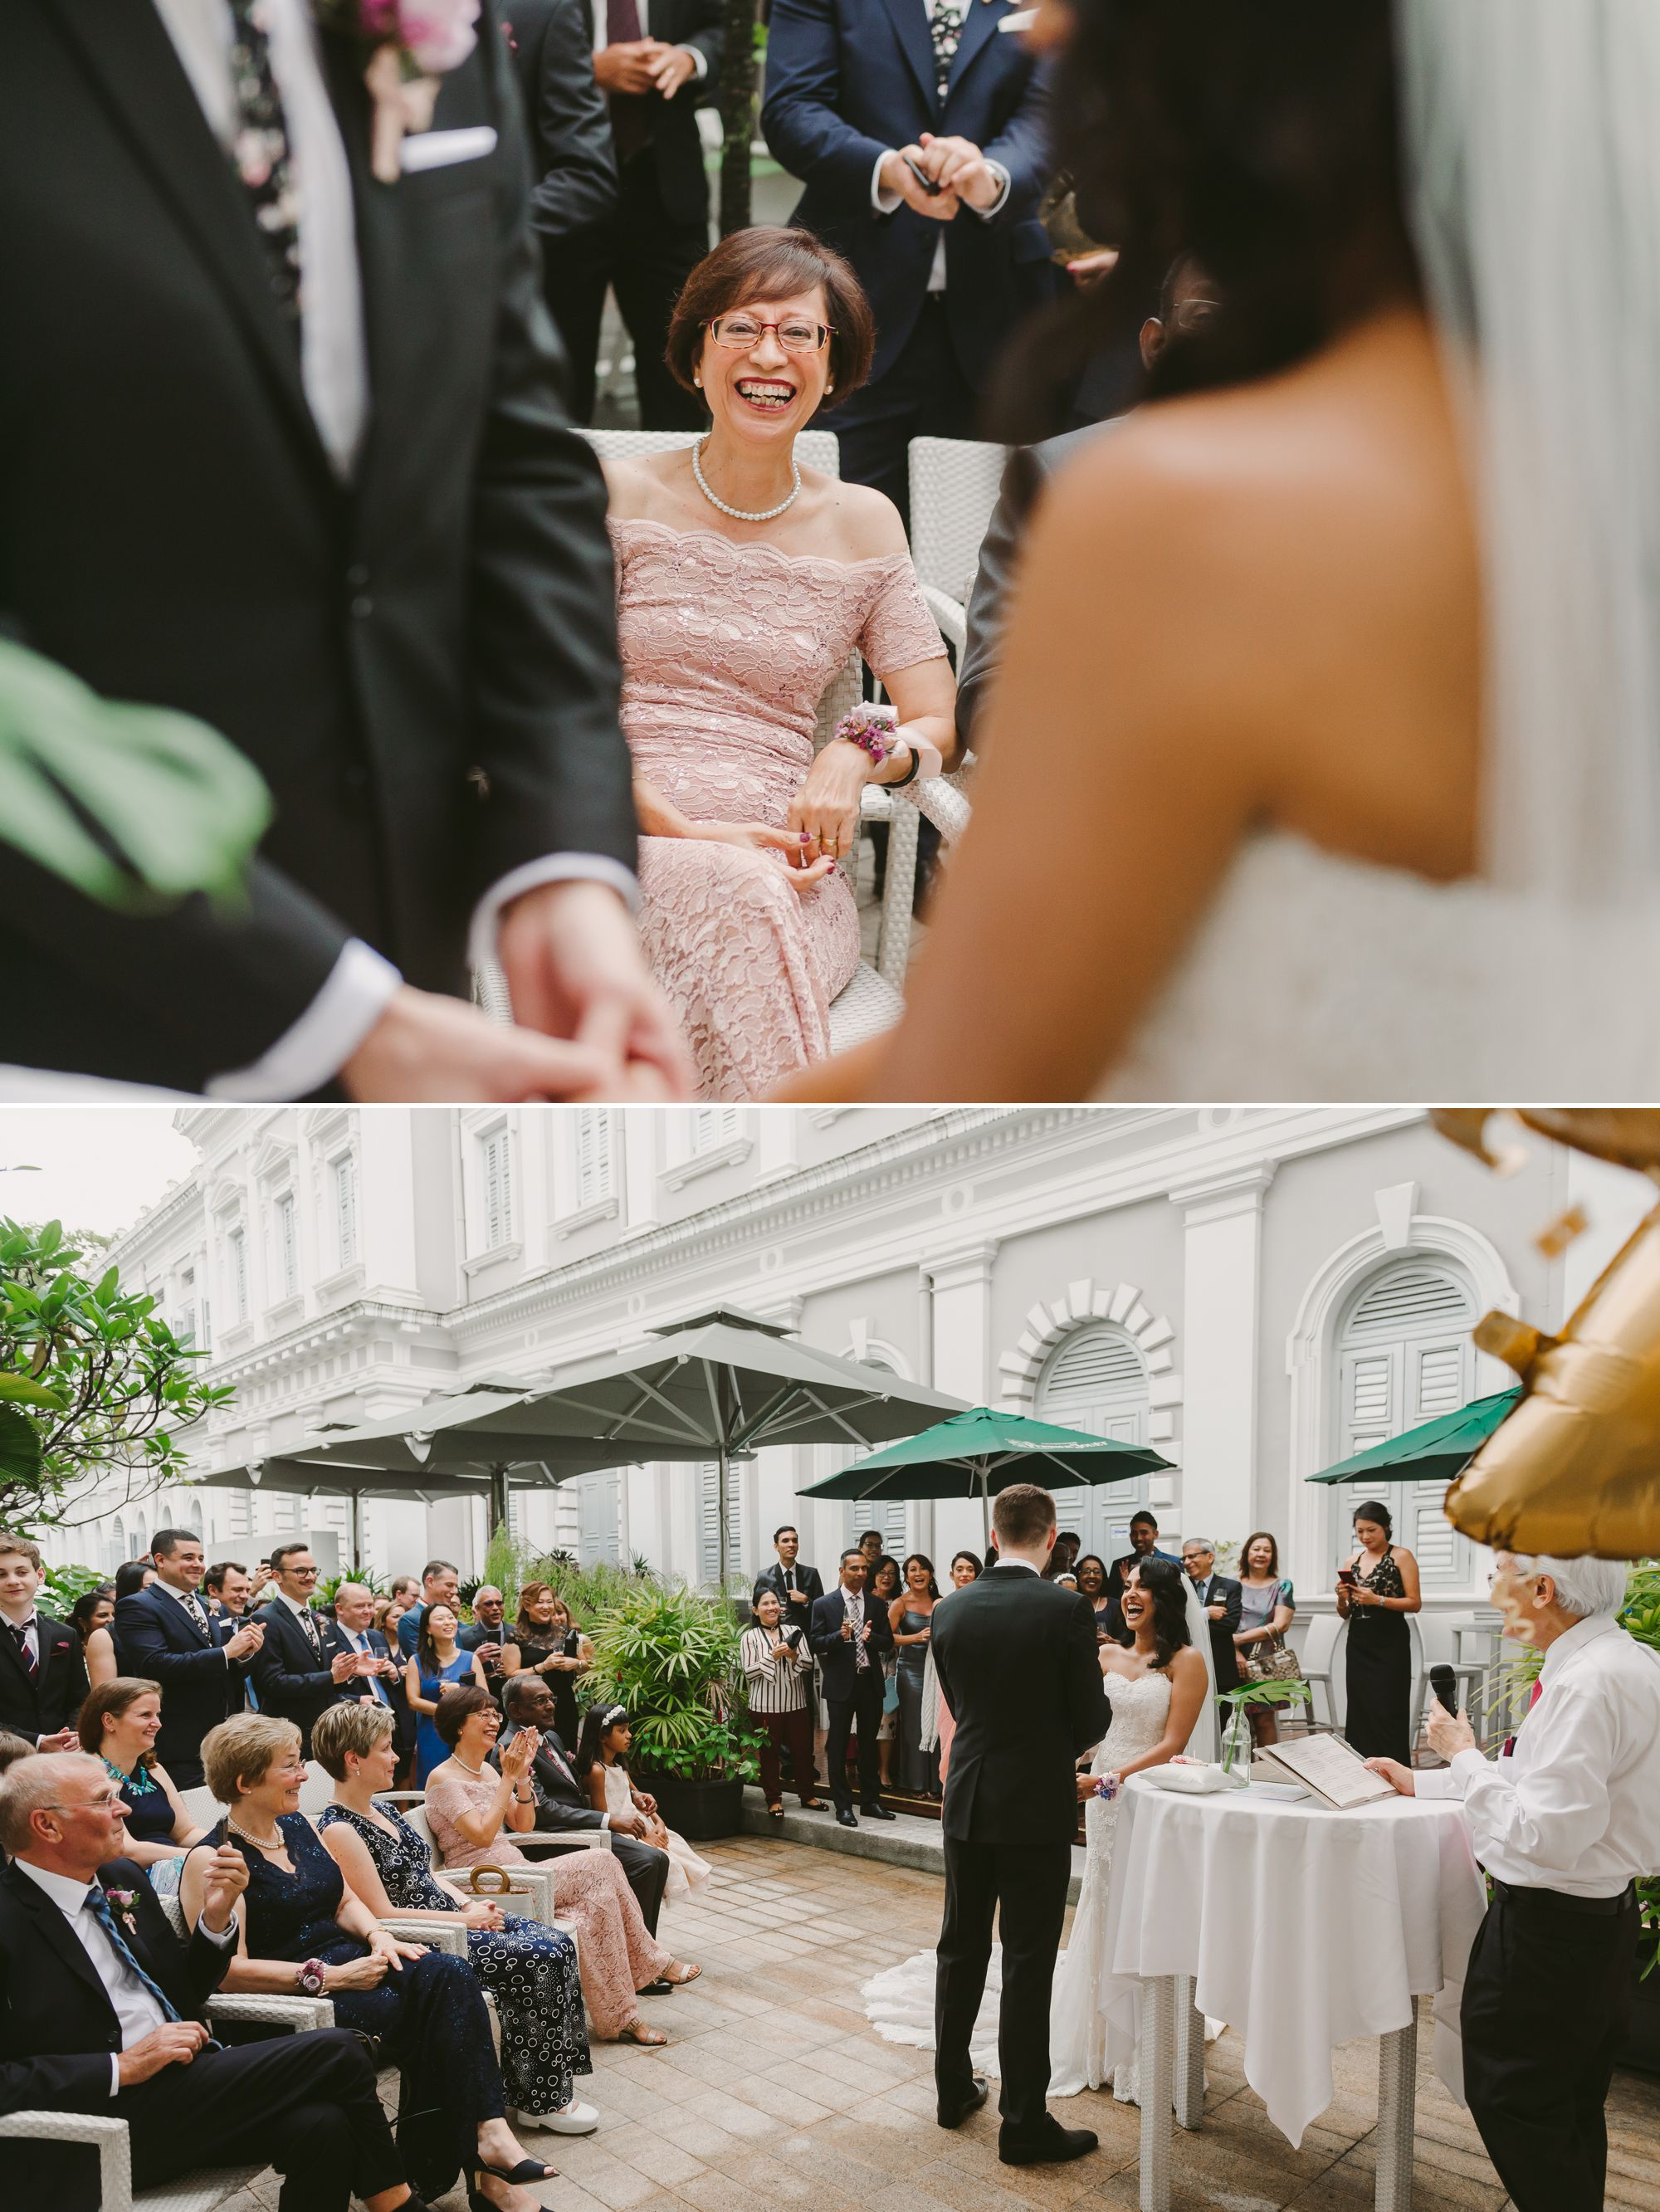 wedding_day_photography_ 17.jpg